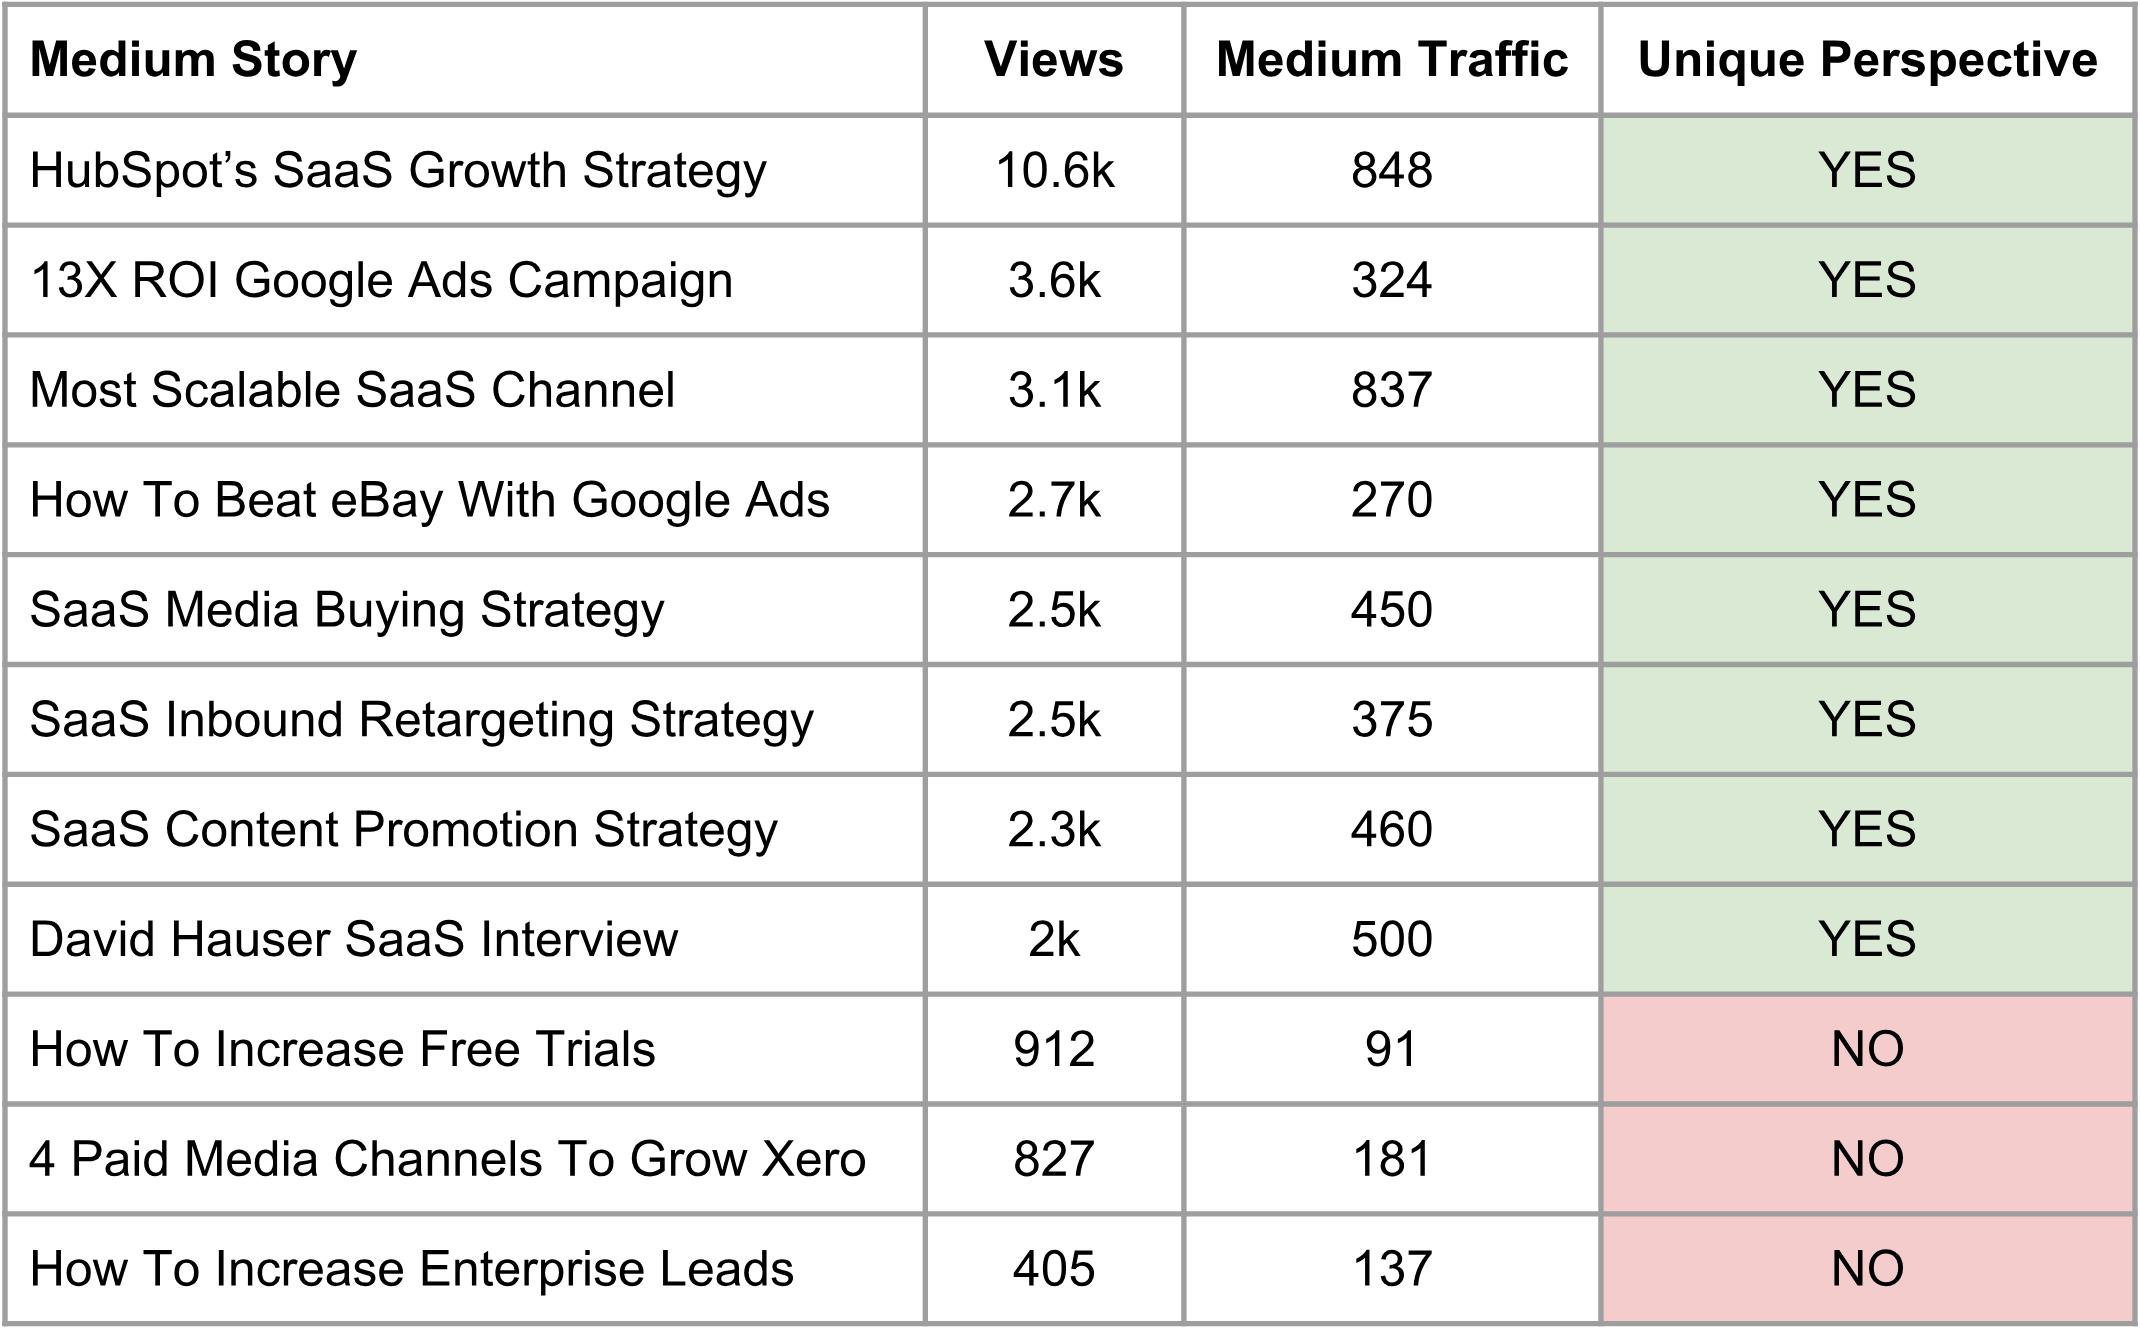 medium stats image